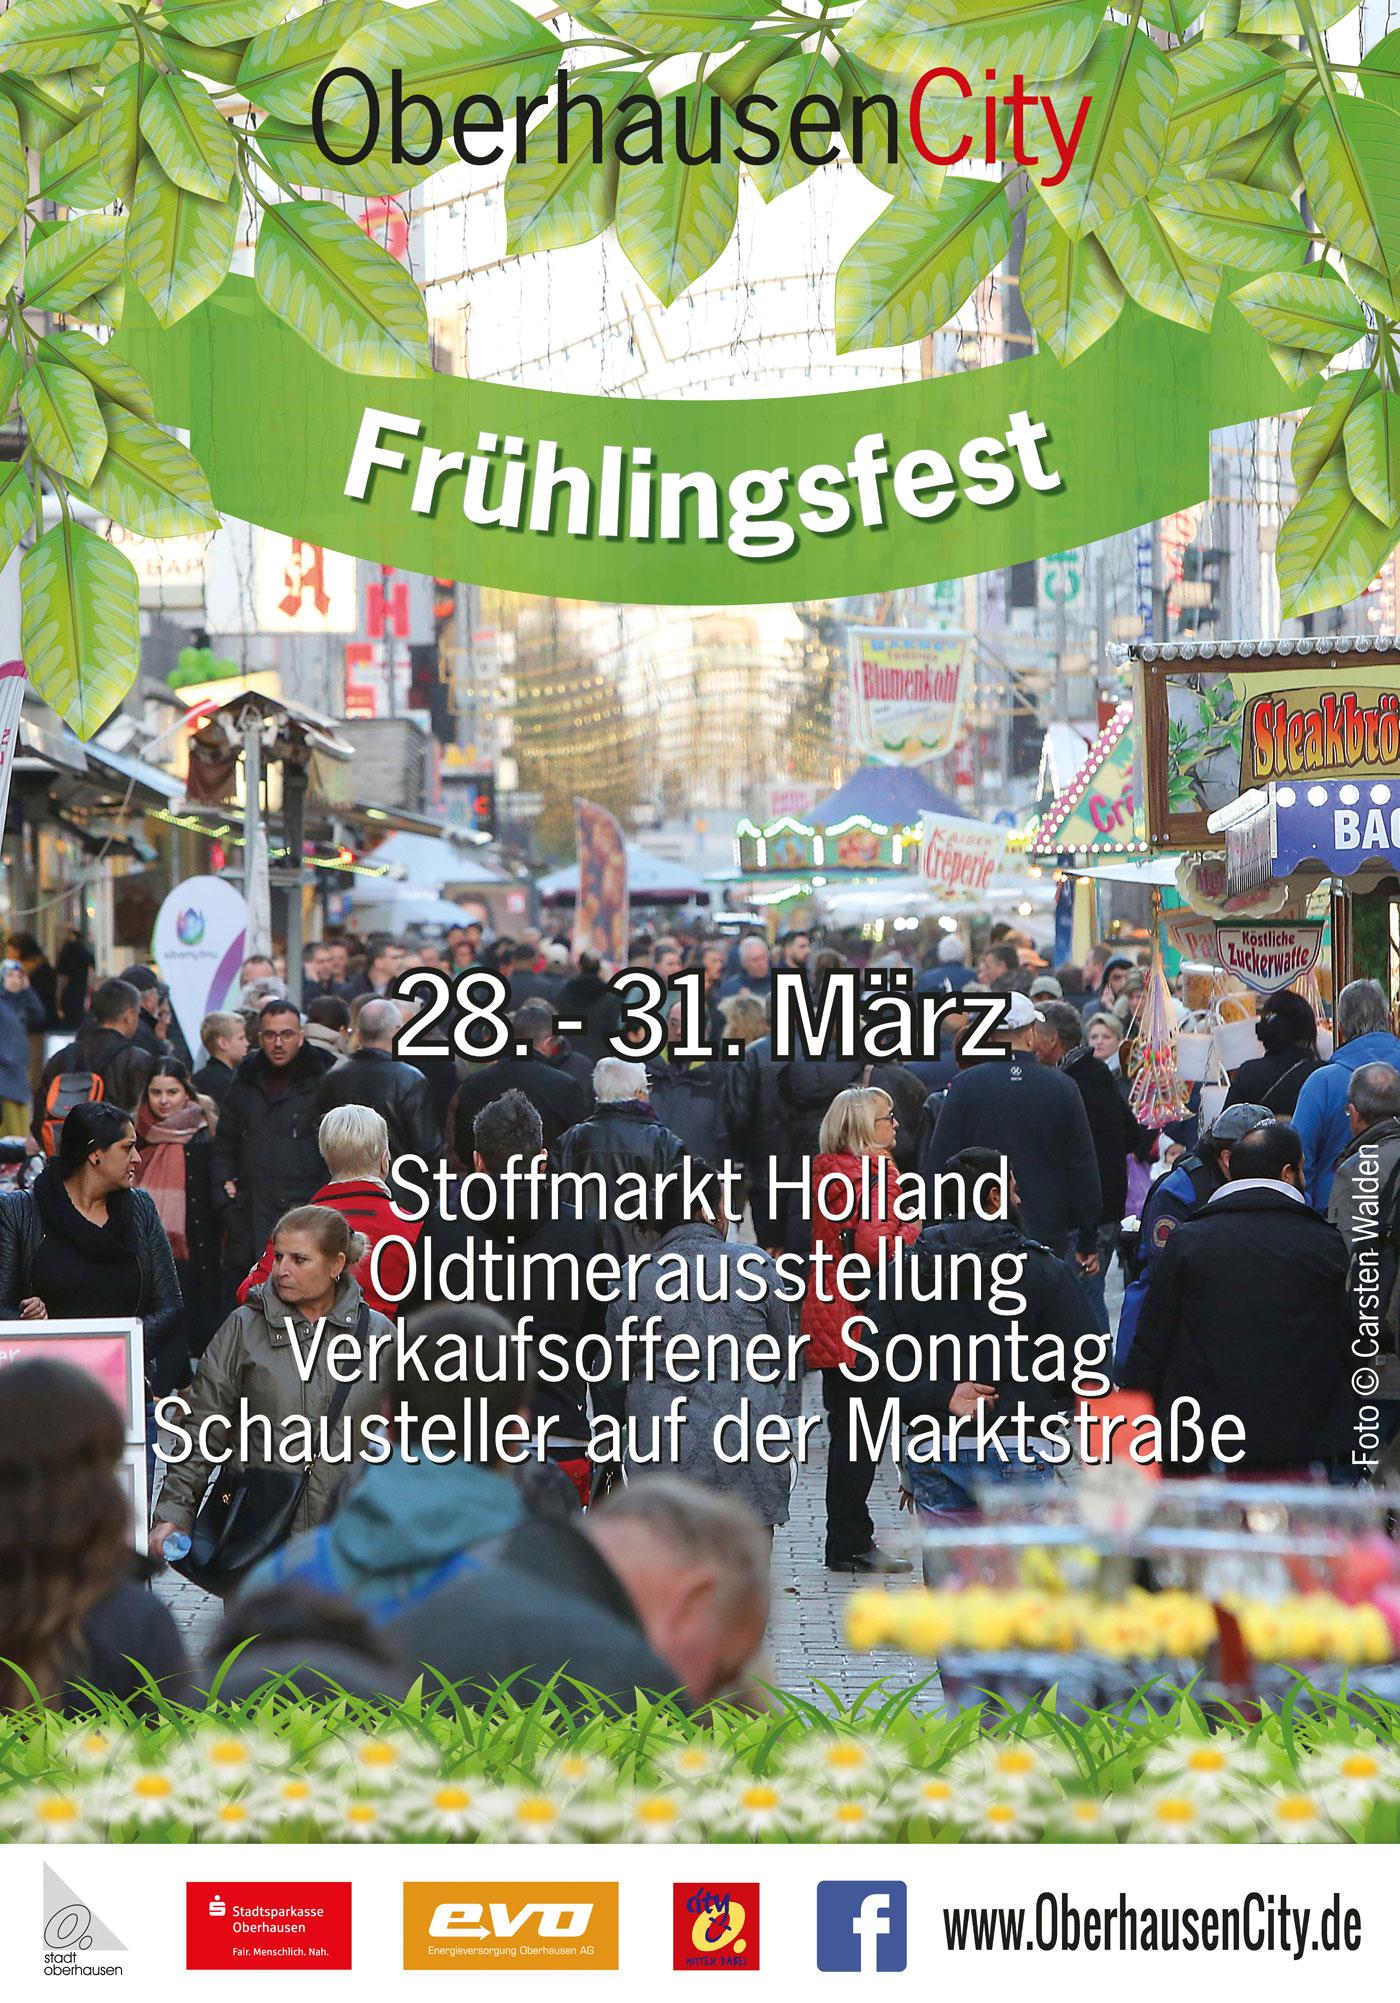 fruehlingsfest-oberhausen.jpg